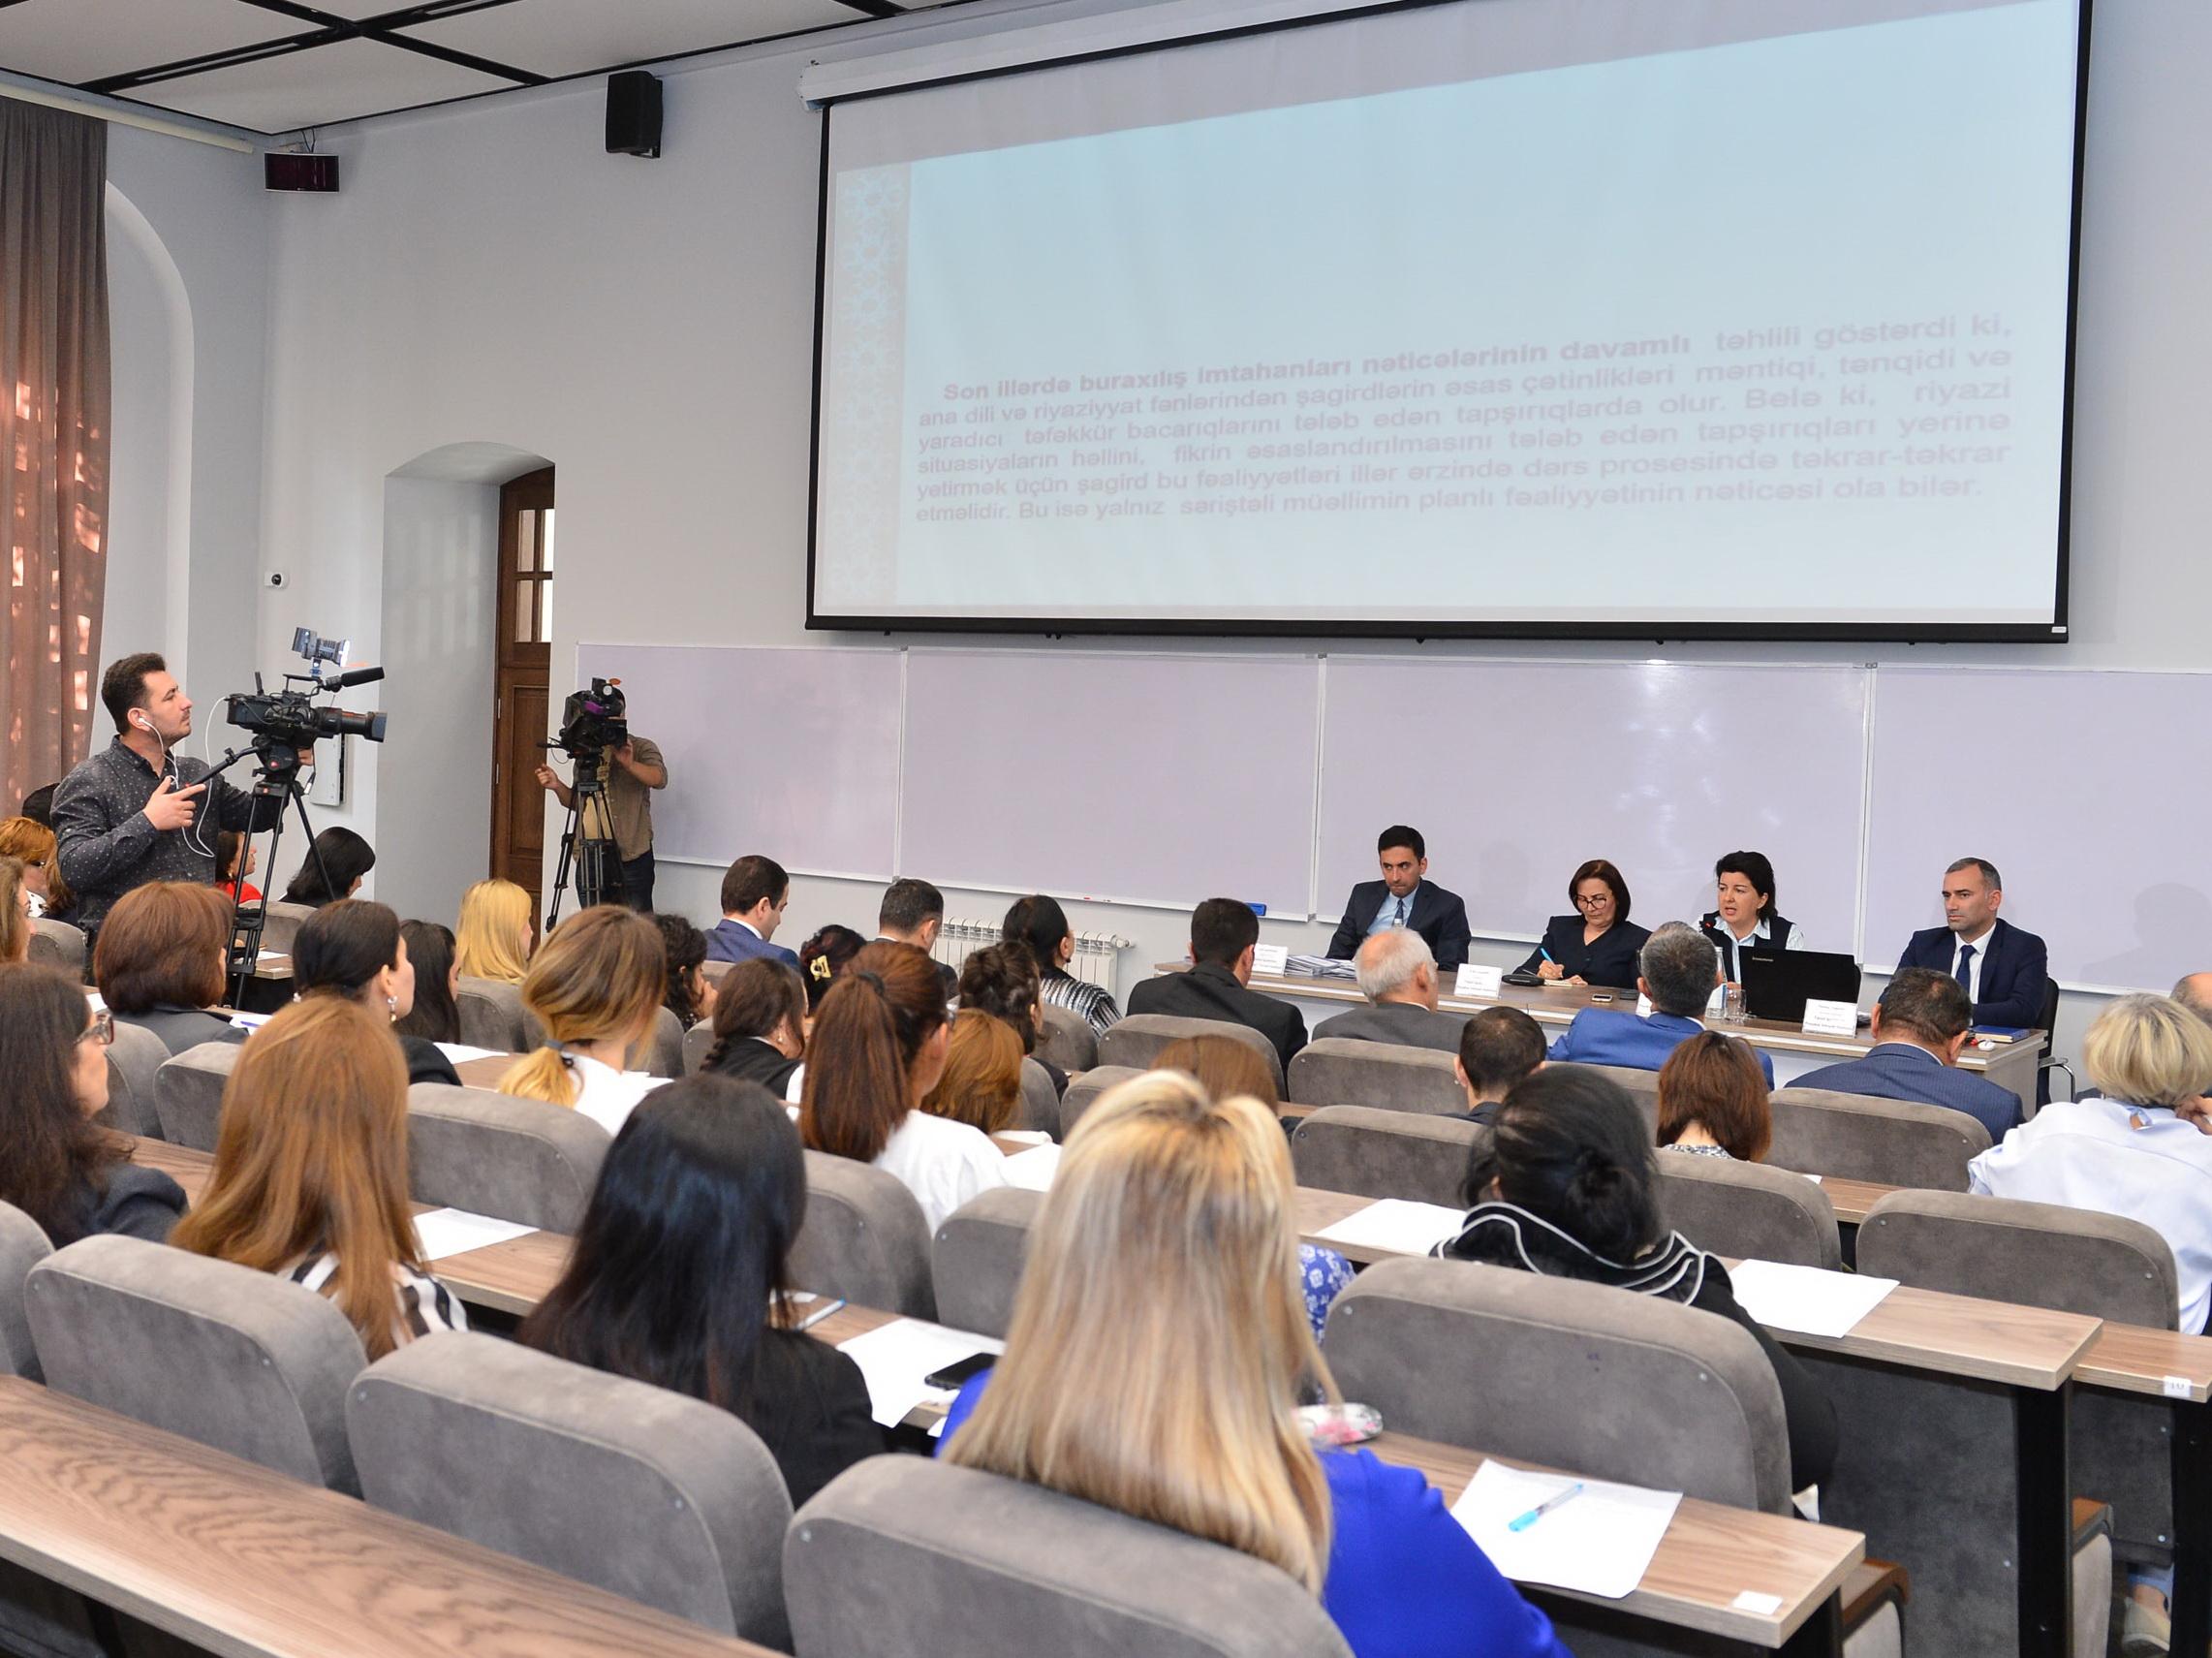 Минобразования провело семинар для журналистов - ФОТО